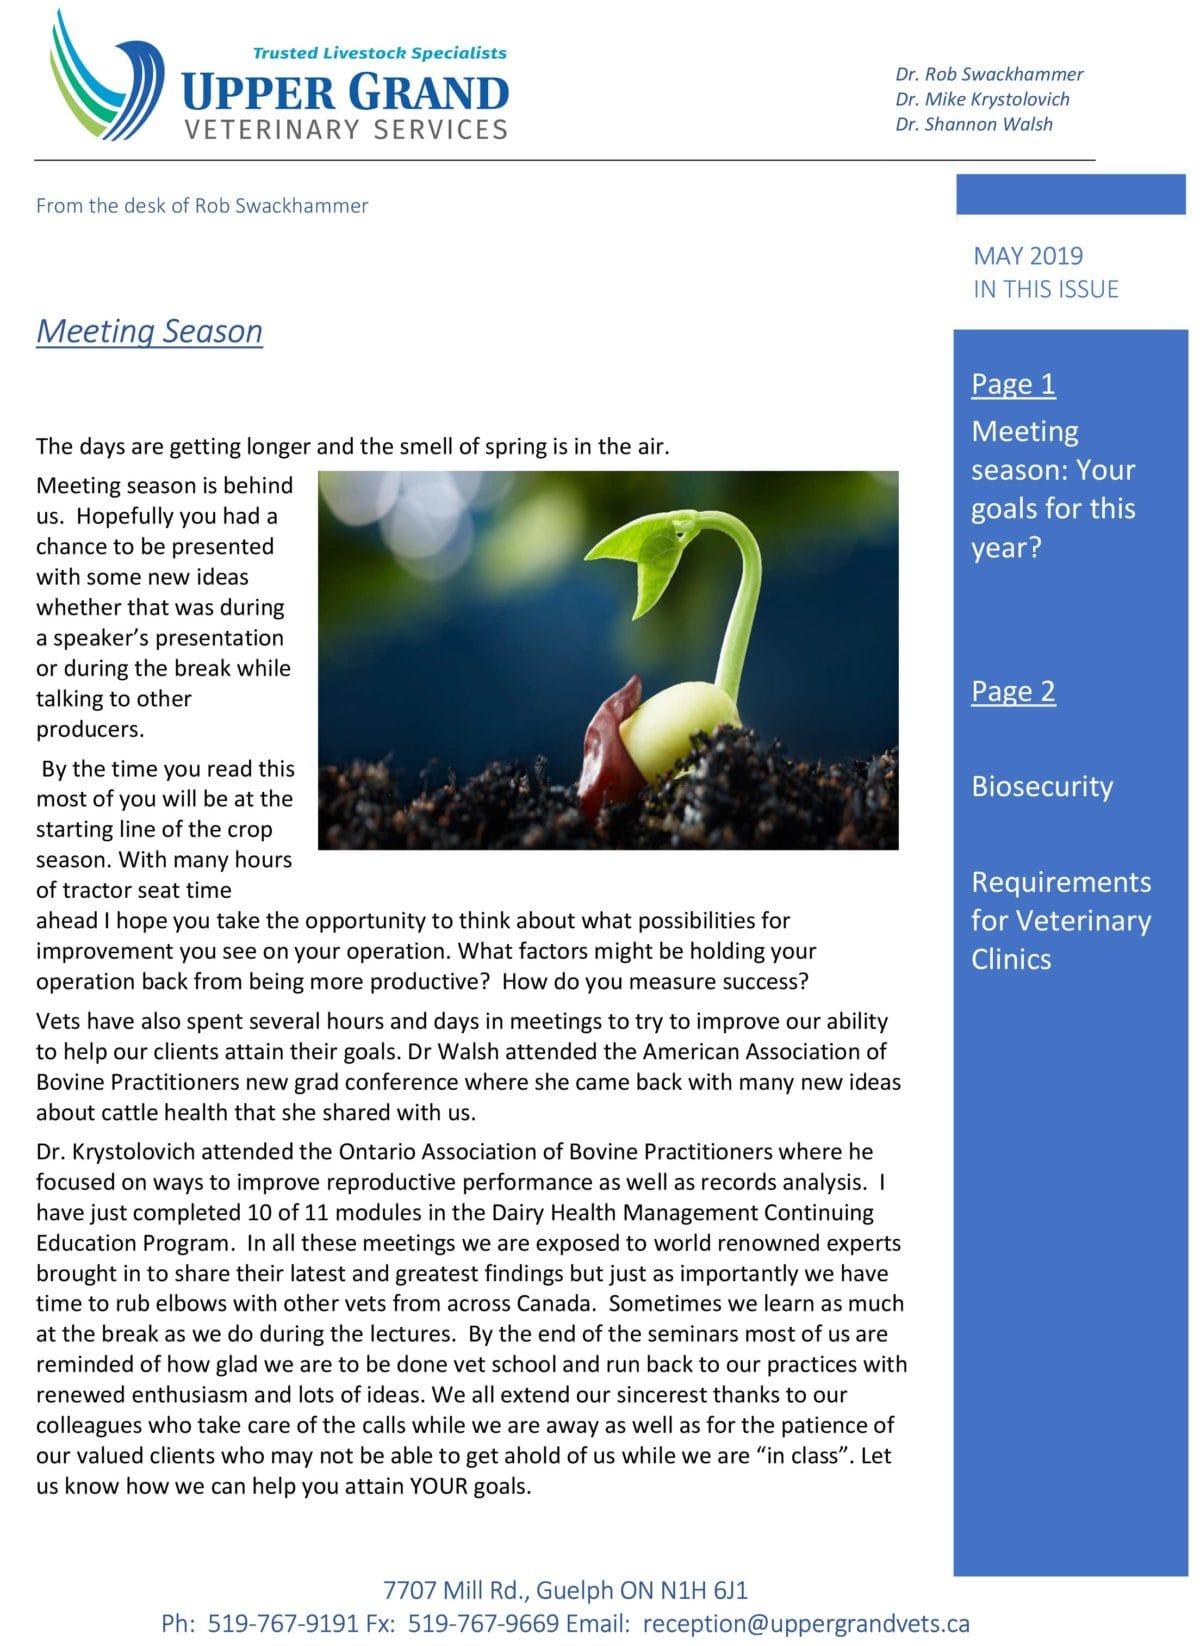 UGVS-Newsletter_May-2019-1-copy-1200x1646.jpg